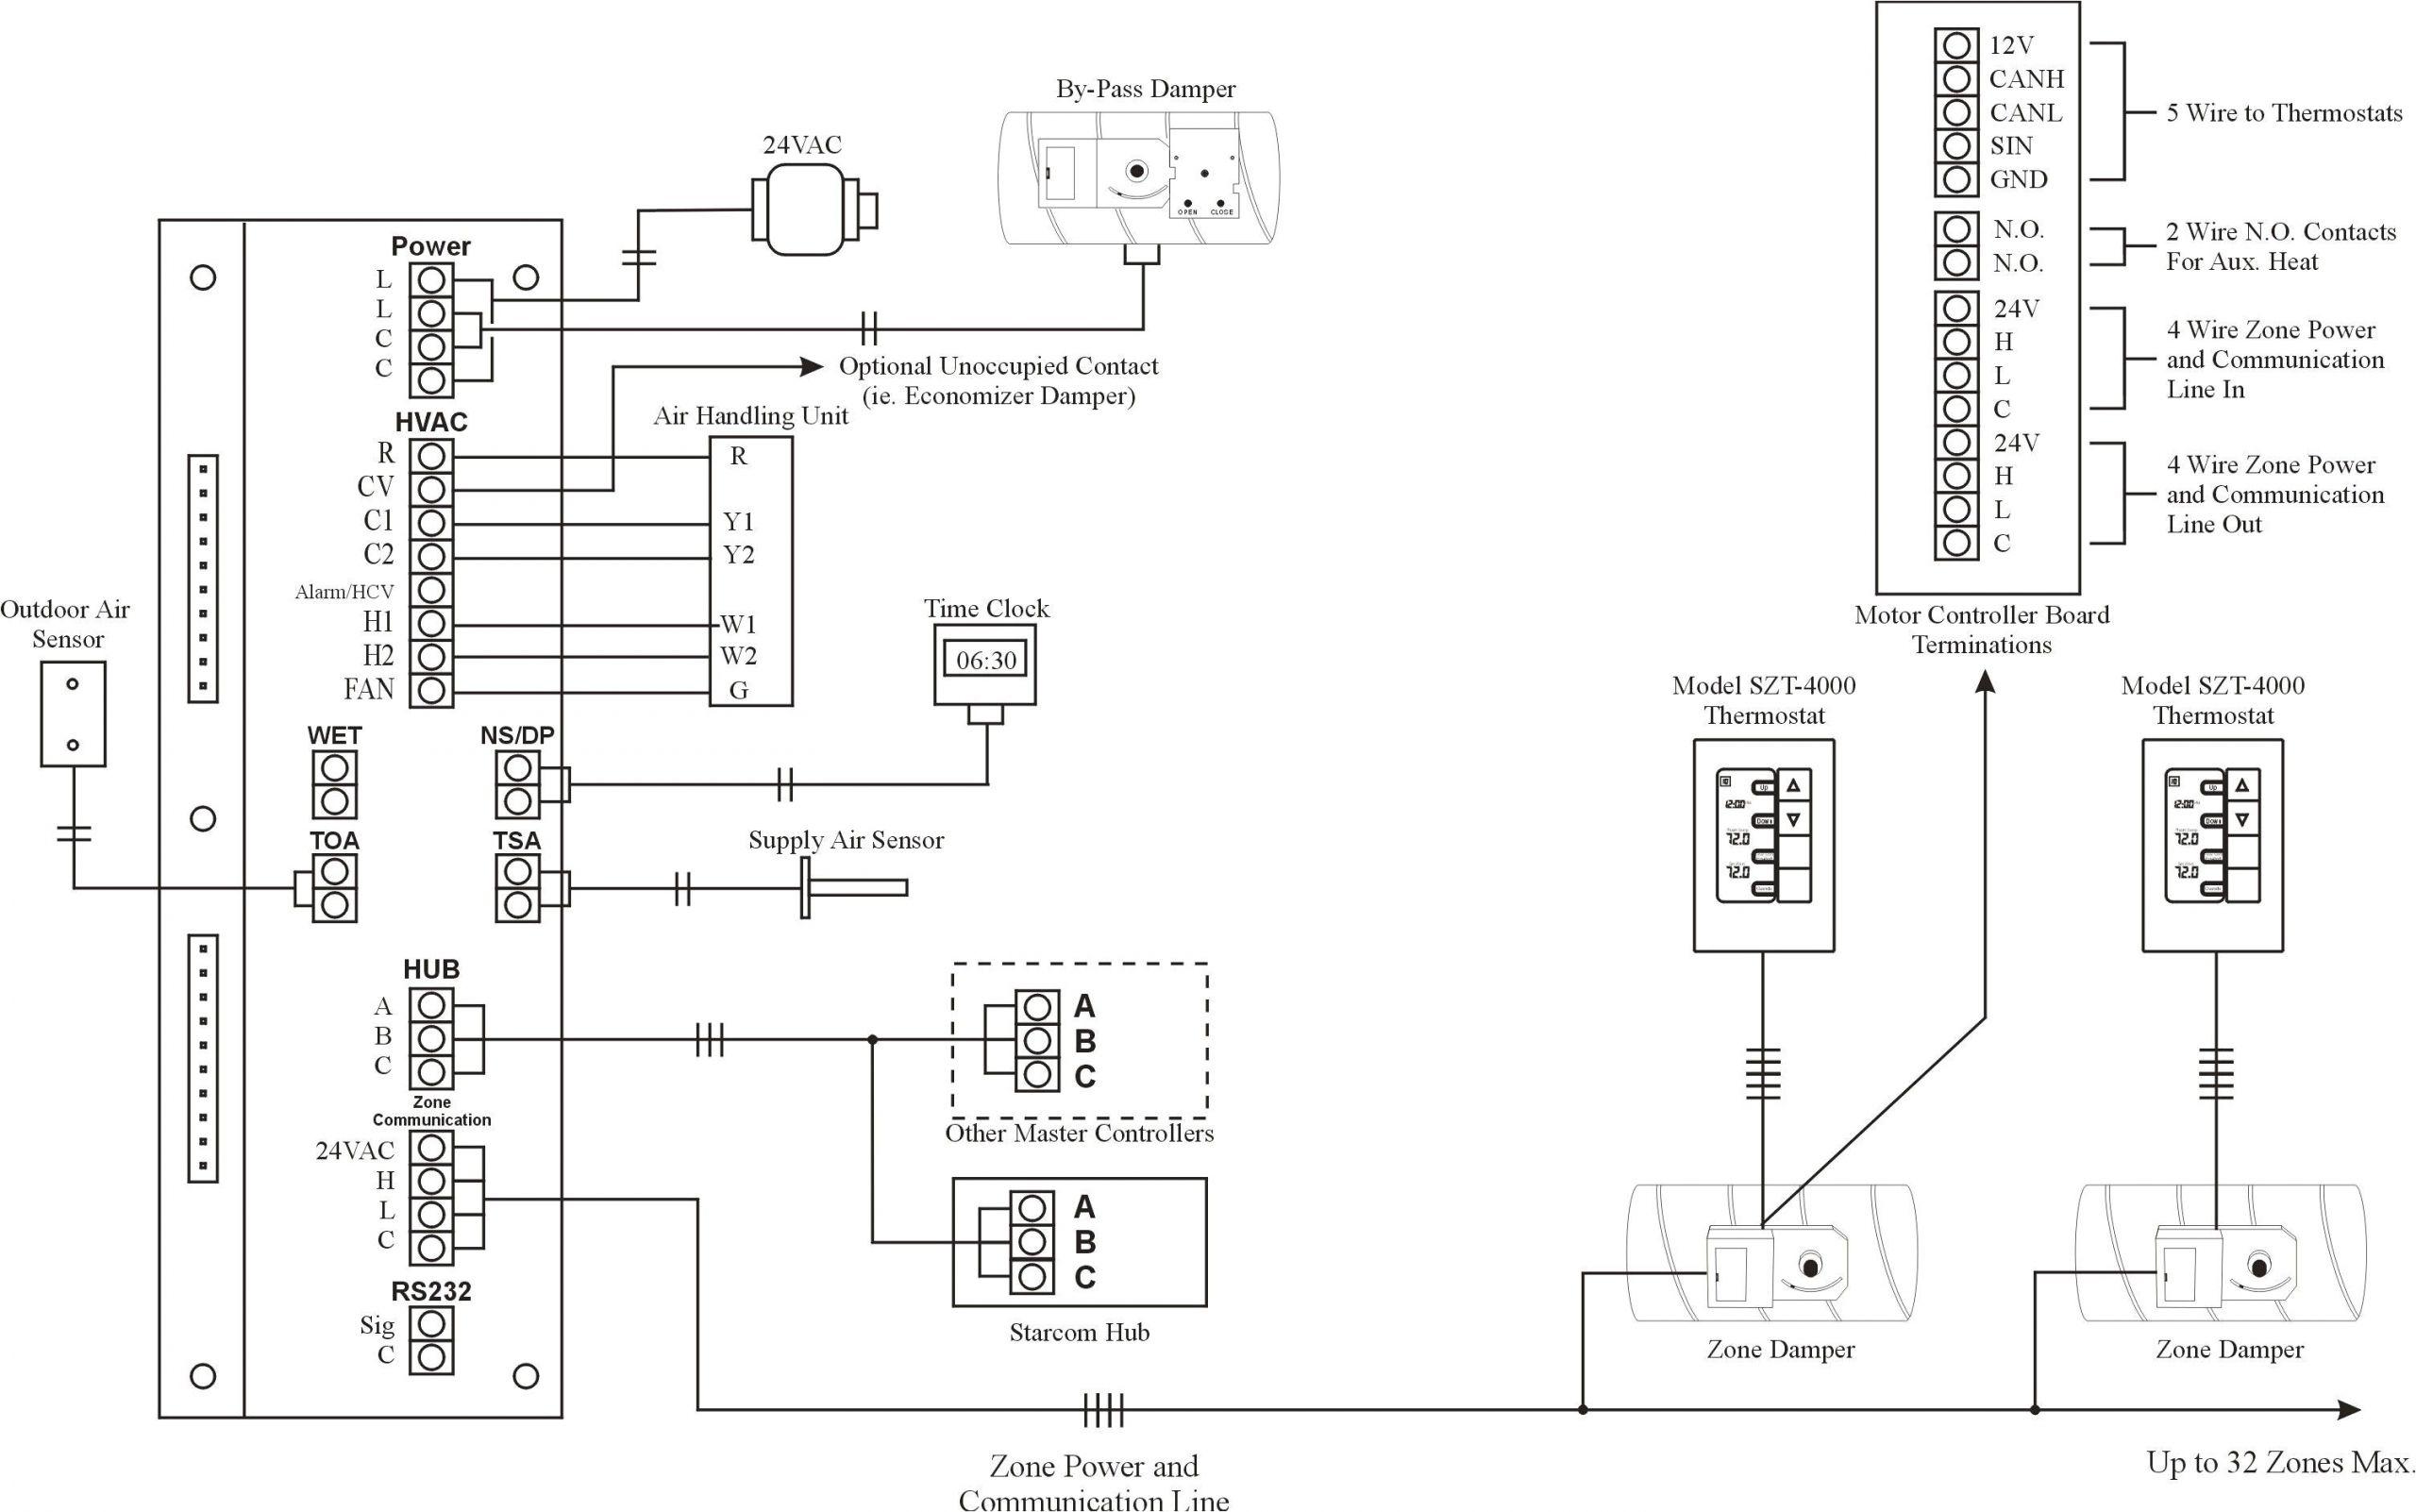 Honeywell Burglar Alarm Wiring Diagram Adt Wiring Diagram Blog Wiring Diagram